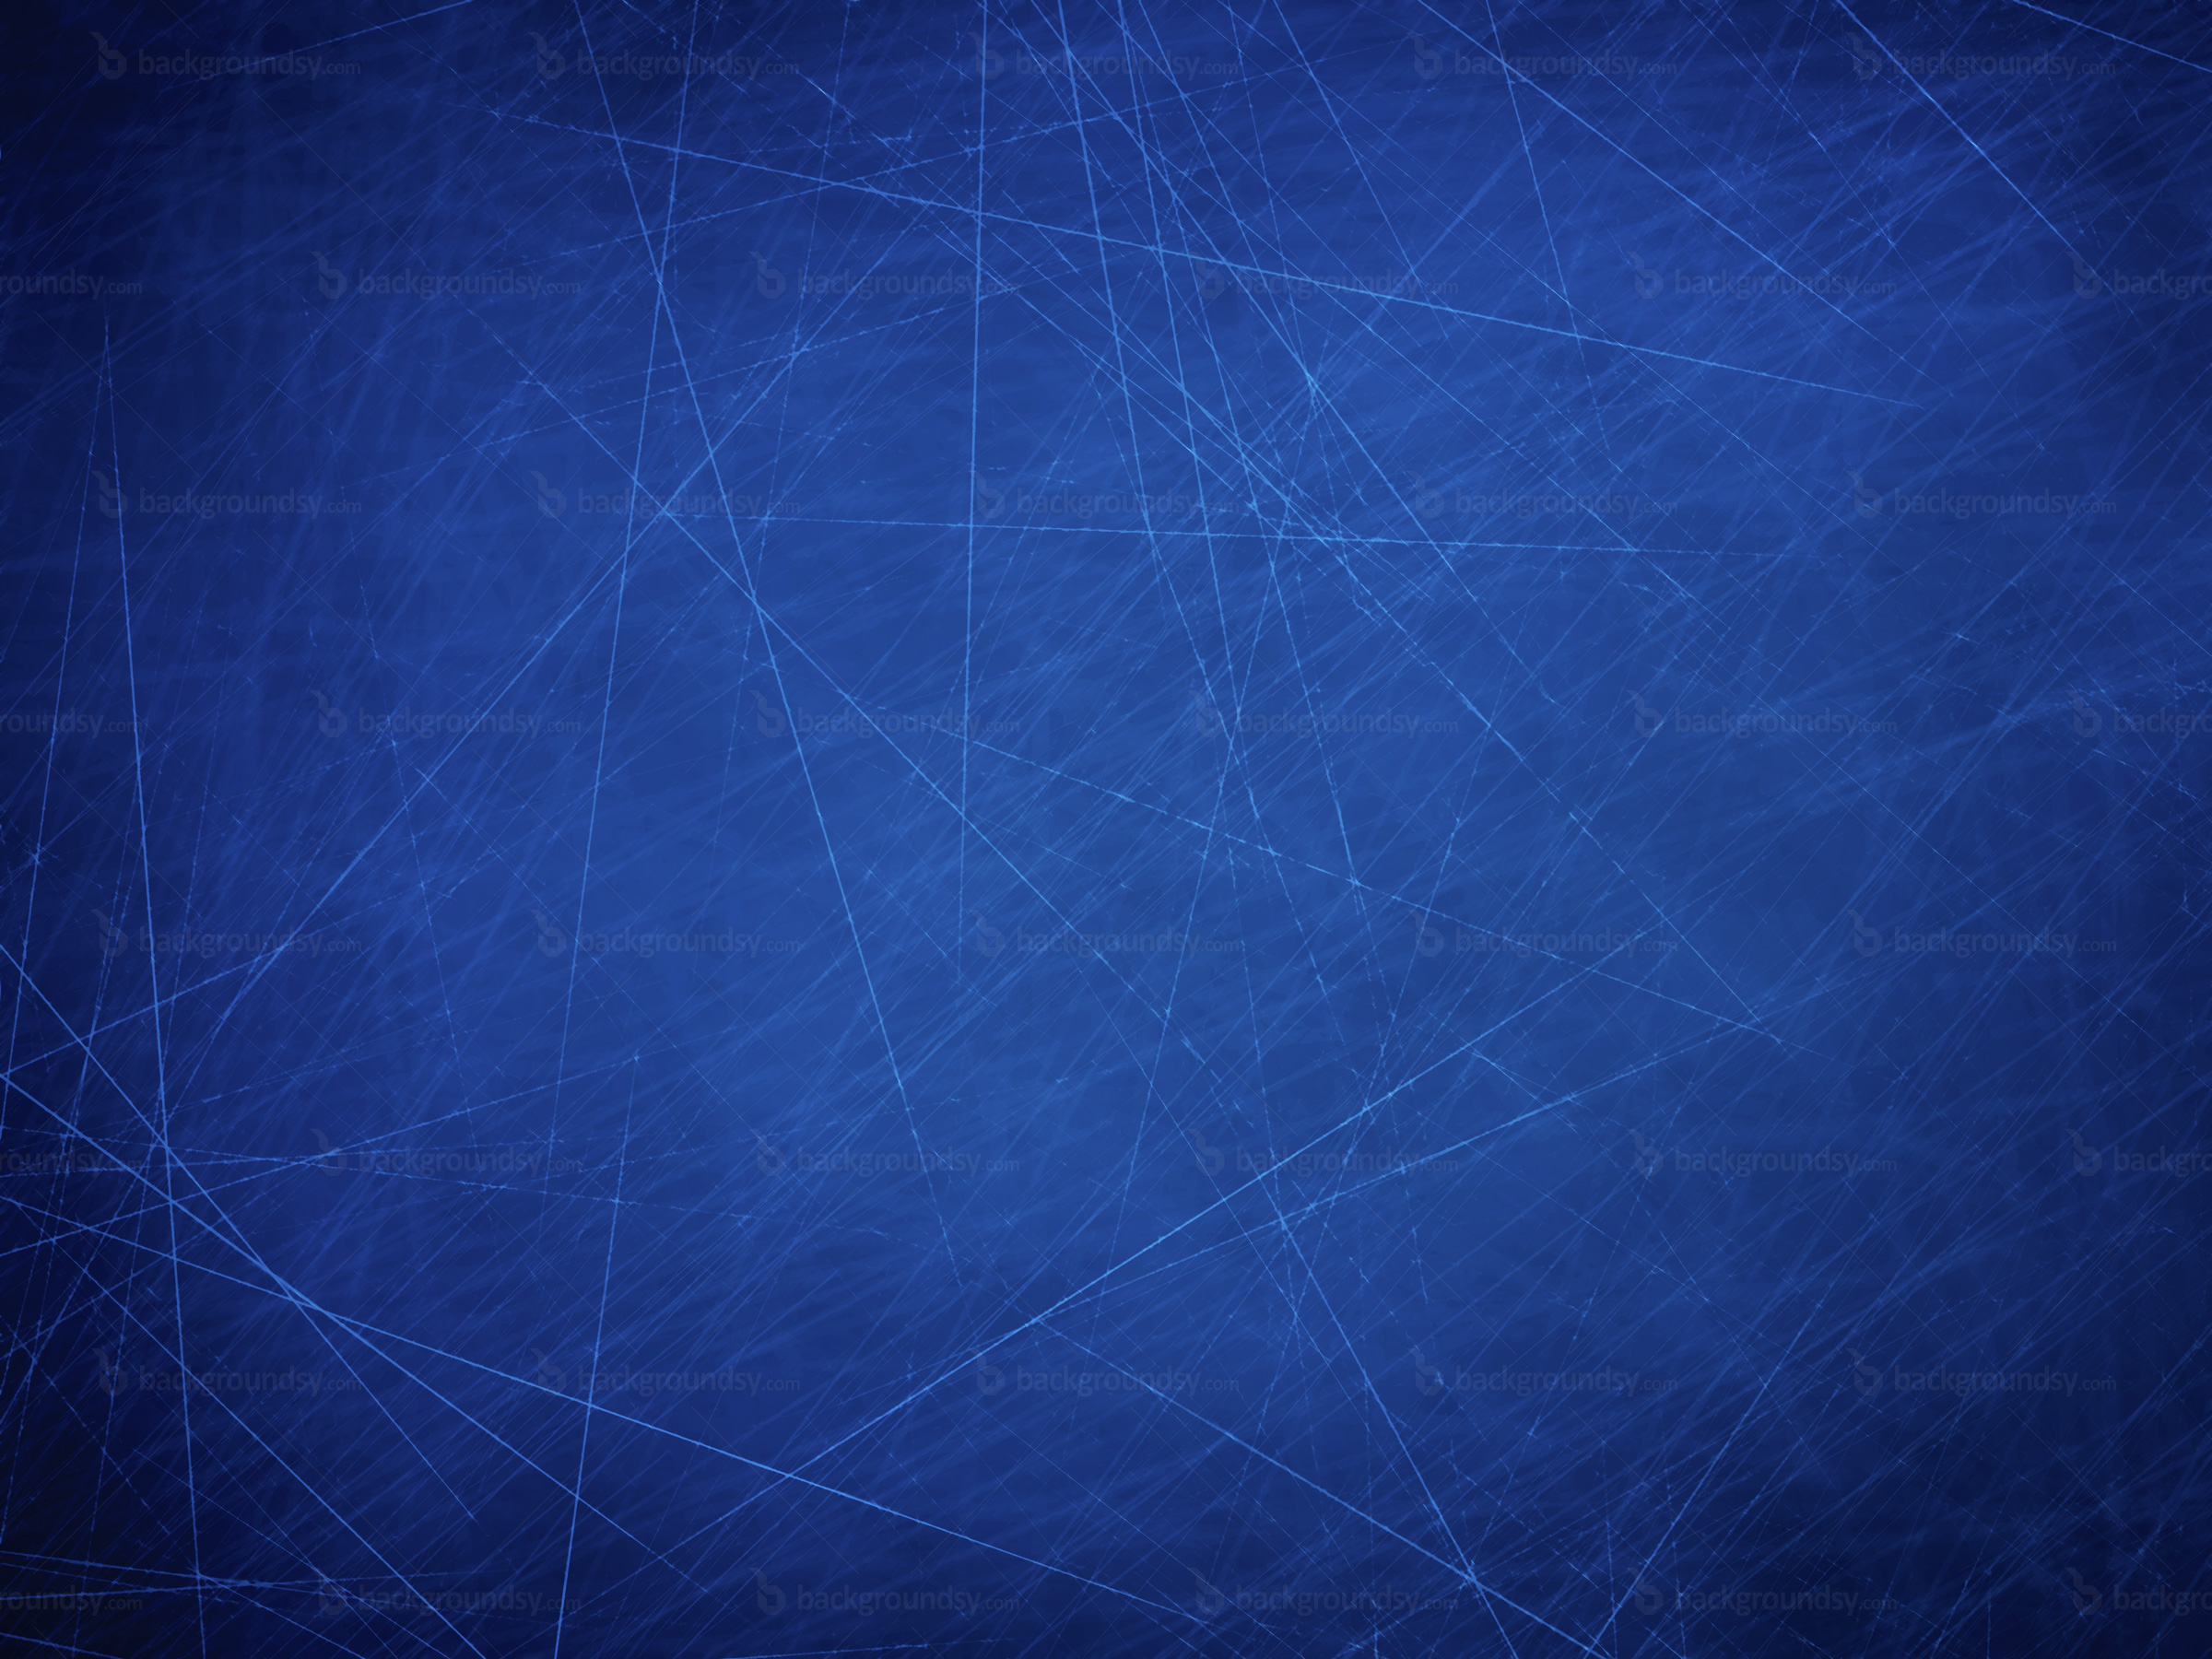 blue scratched texture wallpaper - photo #6